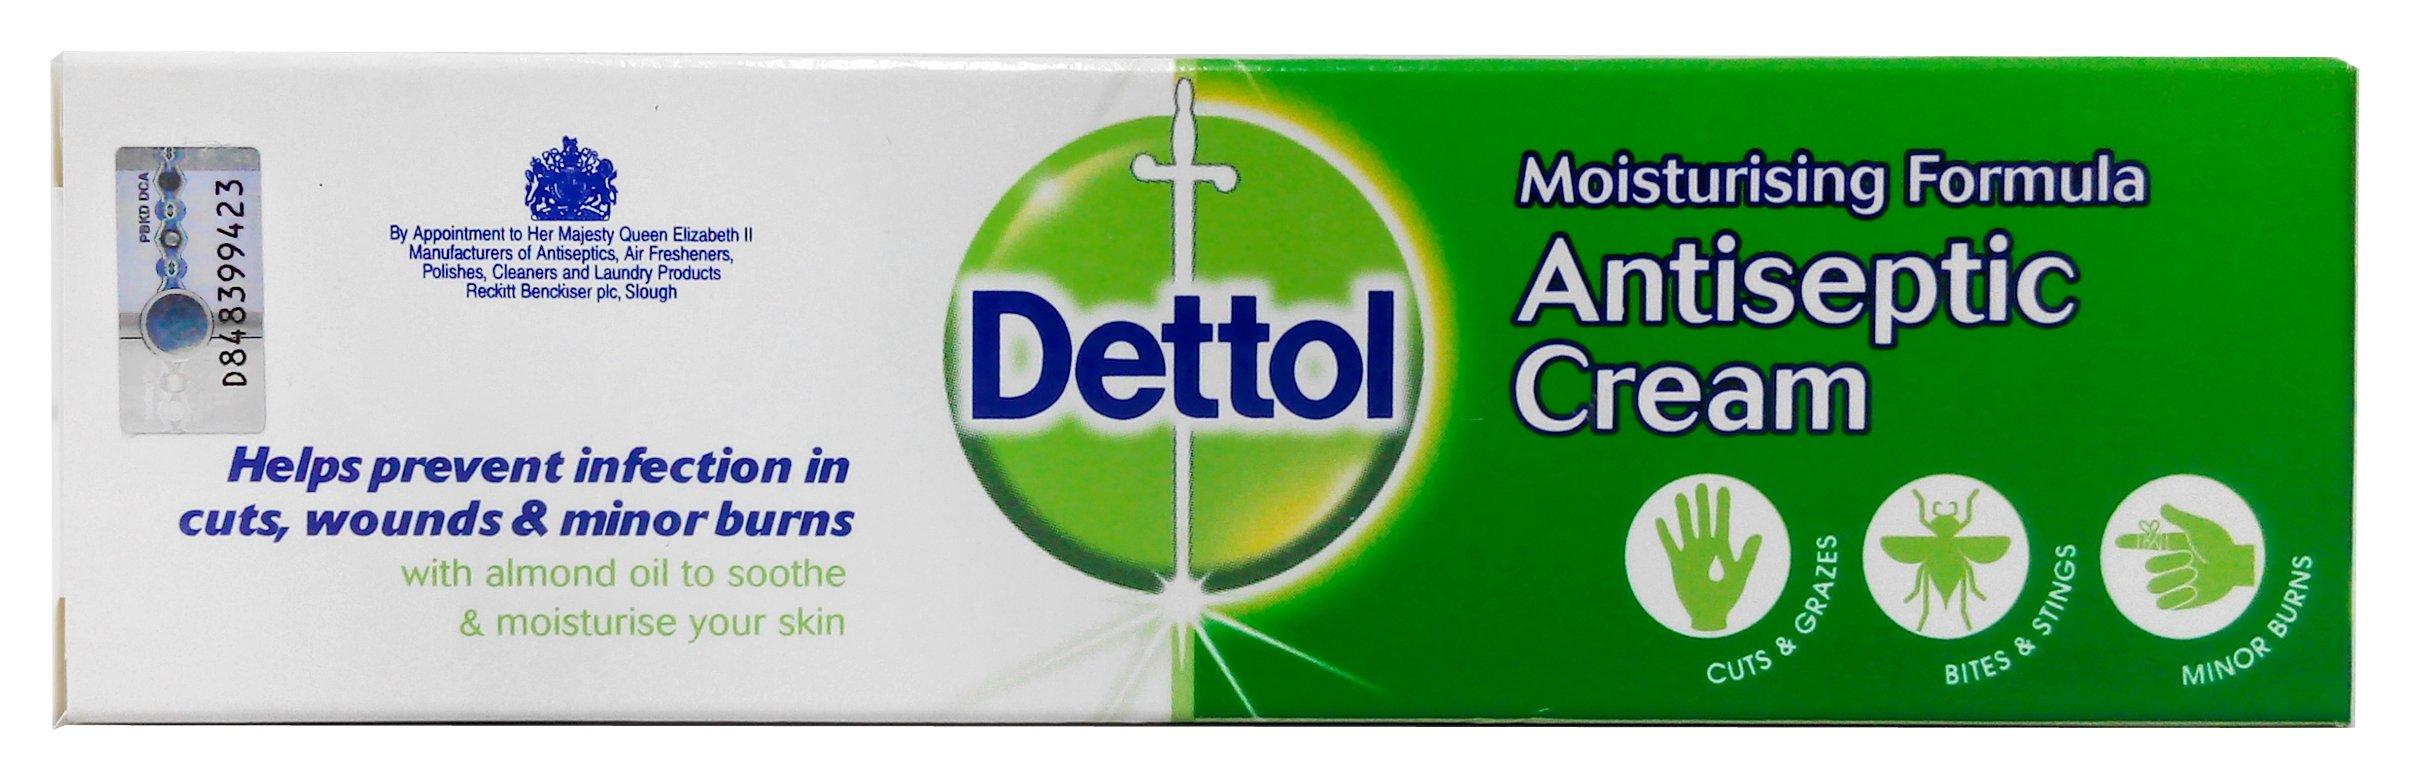 Dettol Refresh Instant Hand Sanitizer 50ml Beauty Original 50 Ml 4 Pcs Antiseptic Cream Moisturising Formula 30g